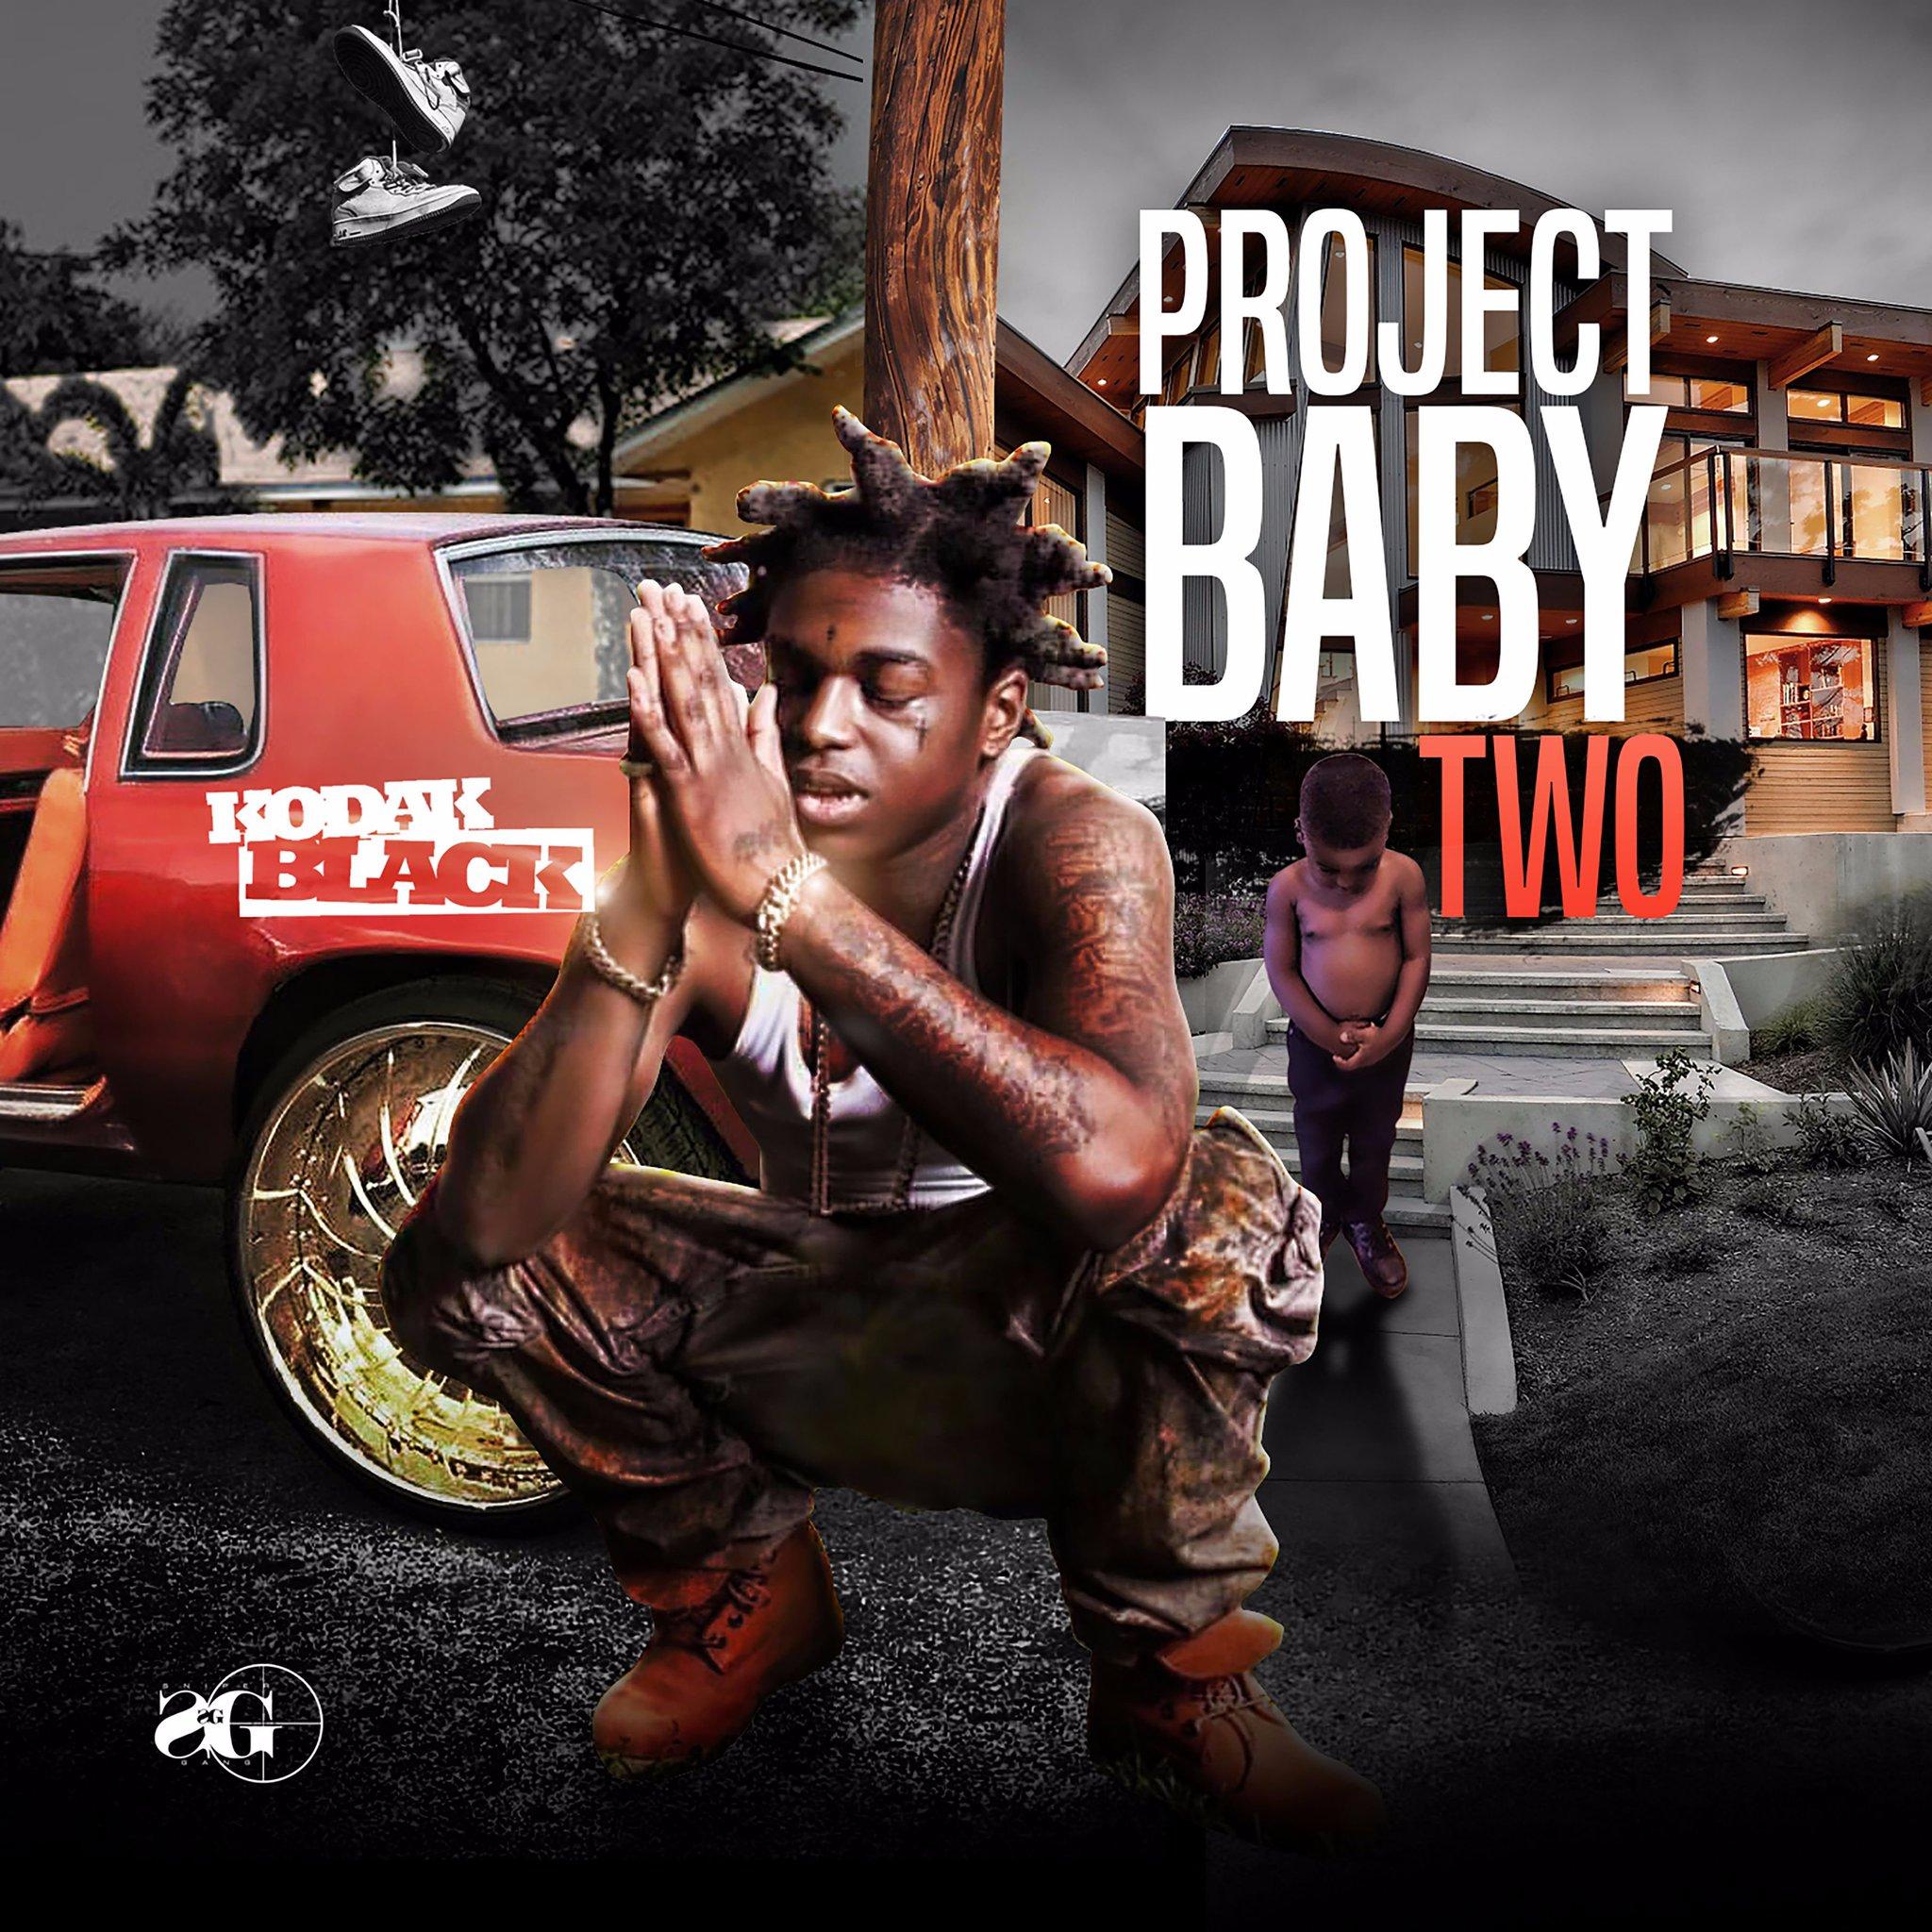 Kodak Black just dropped 'Project Baby 2' https://t.co/e465DV5H3F https://t.co/nAIW6ipGsR